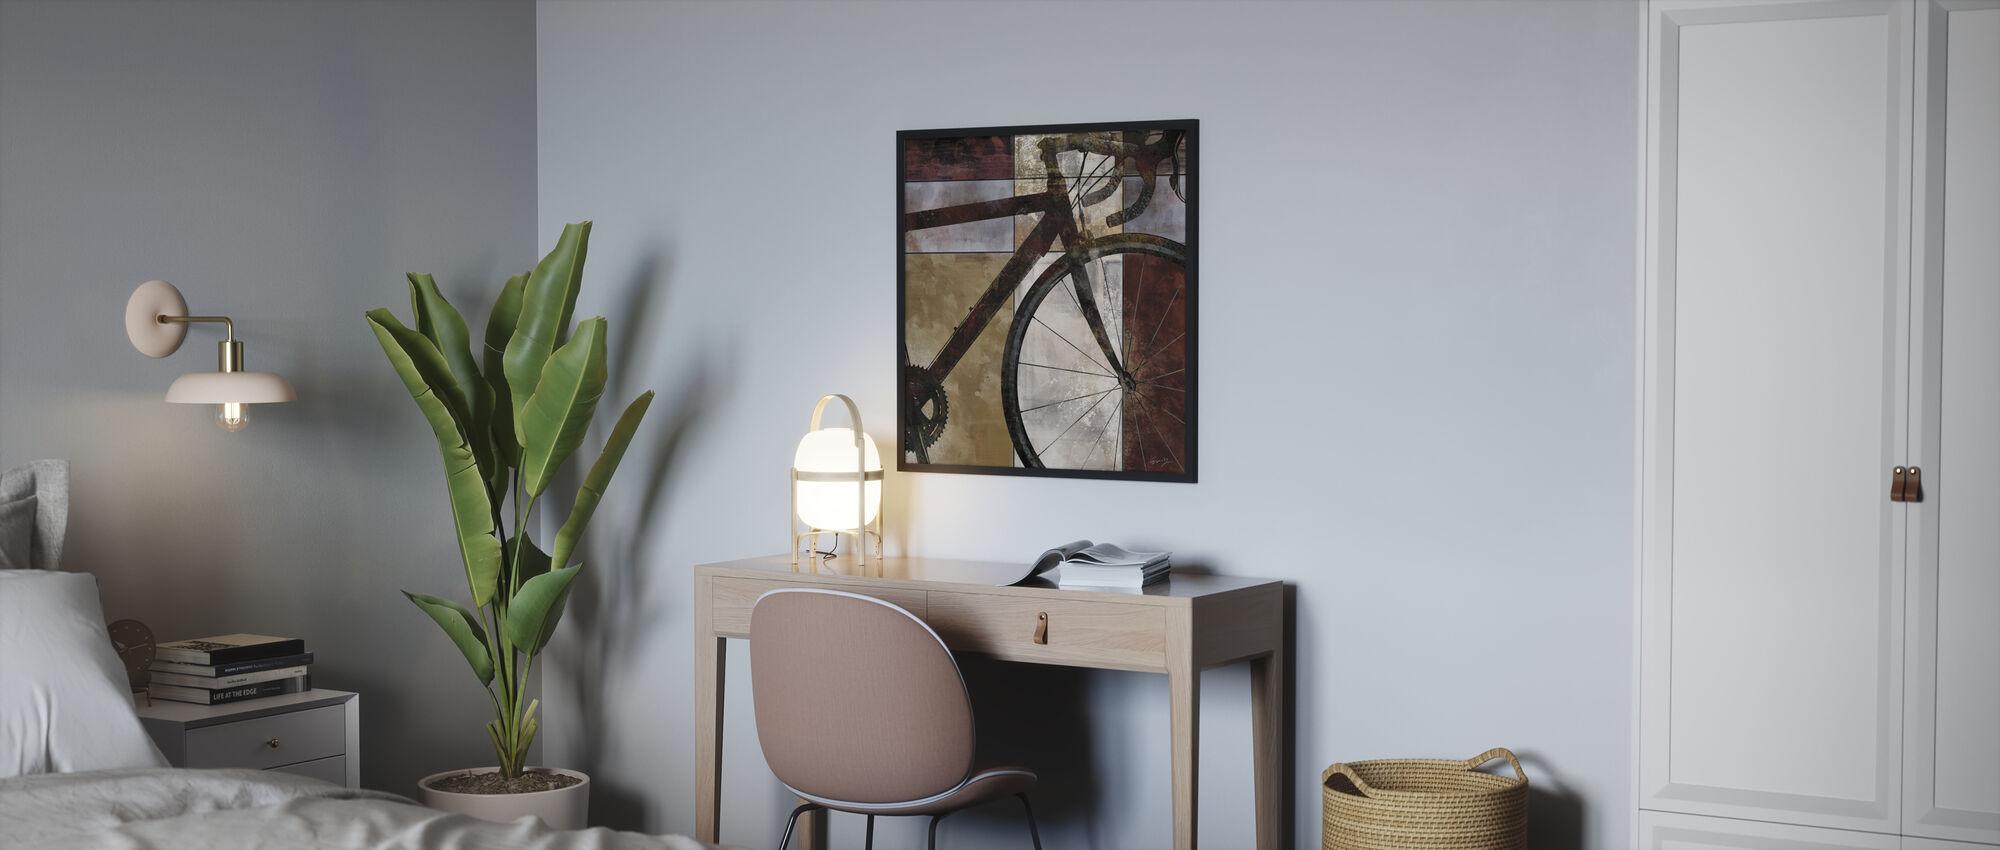 Cykel Kunst - Plakat - Soveværelse